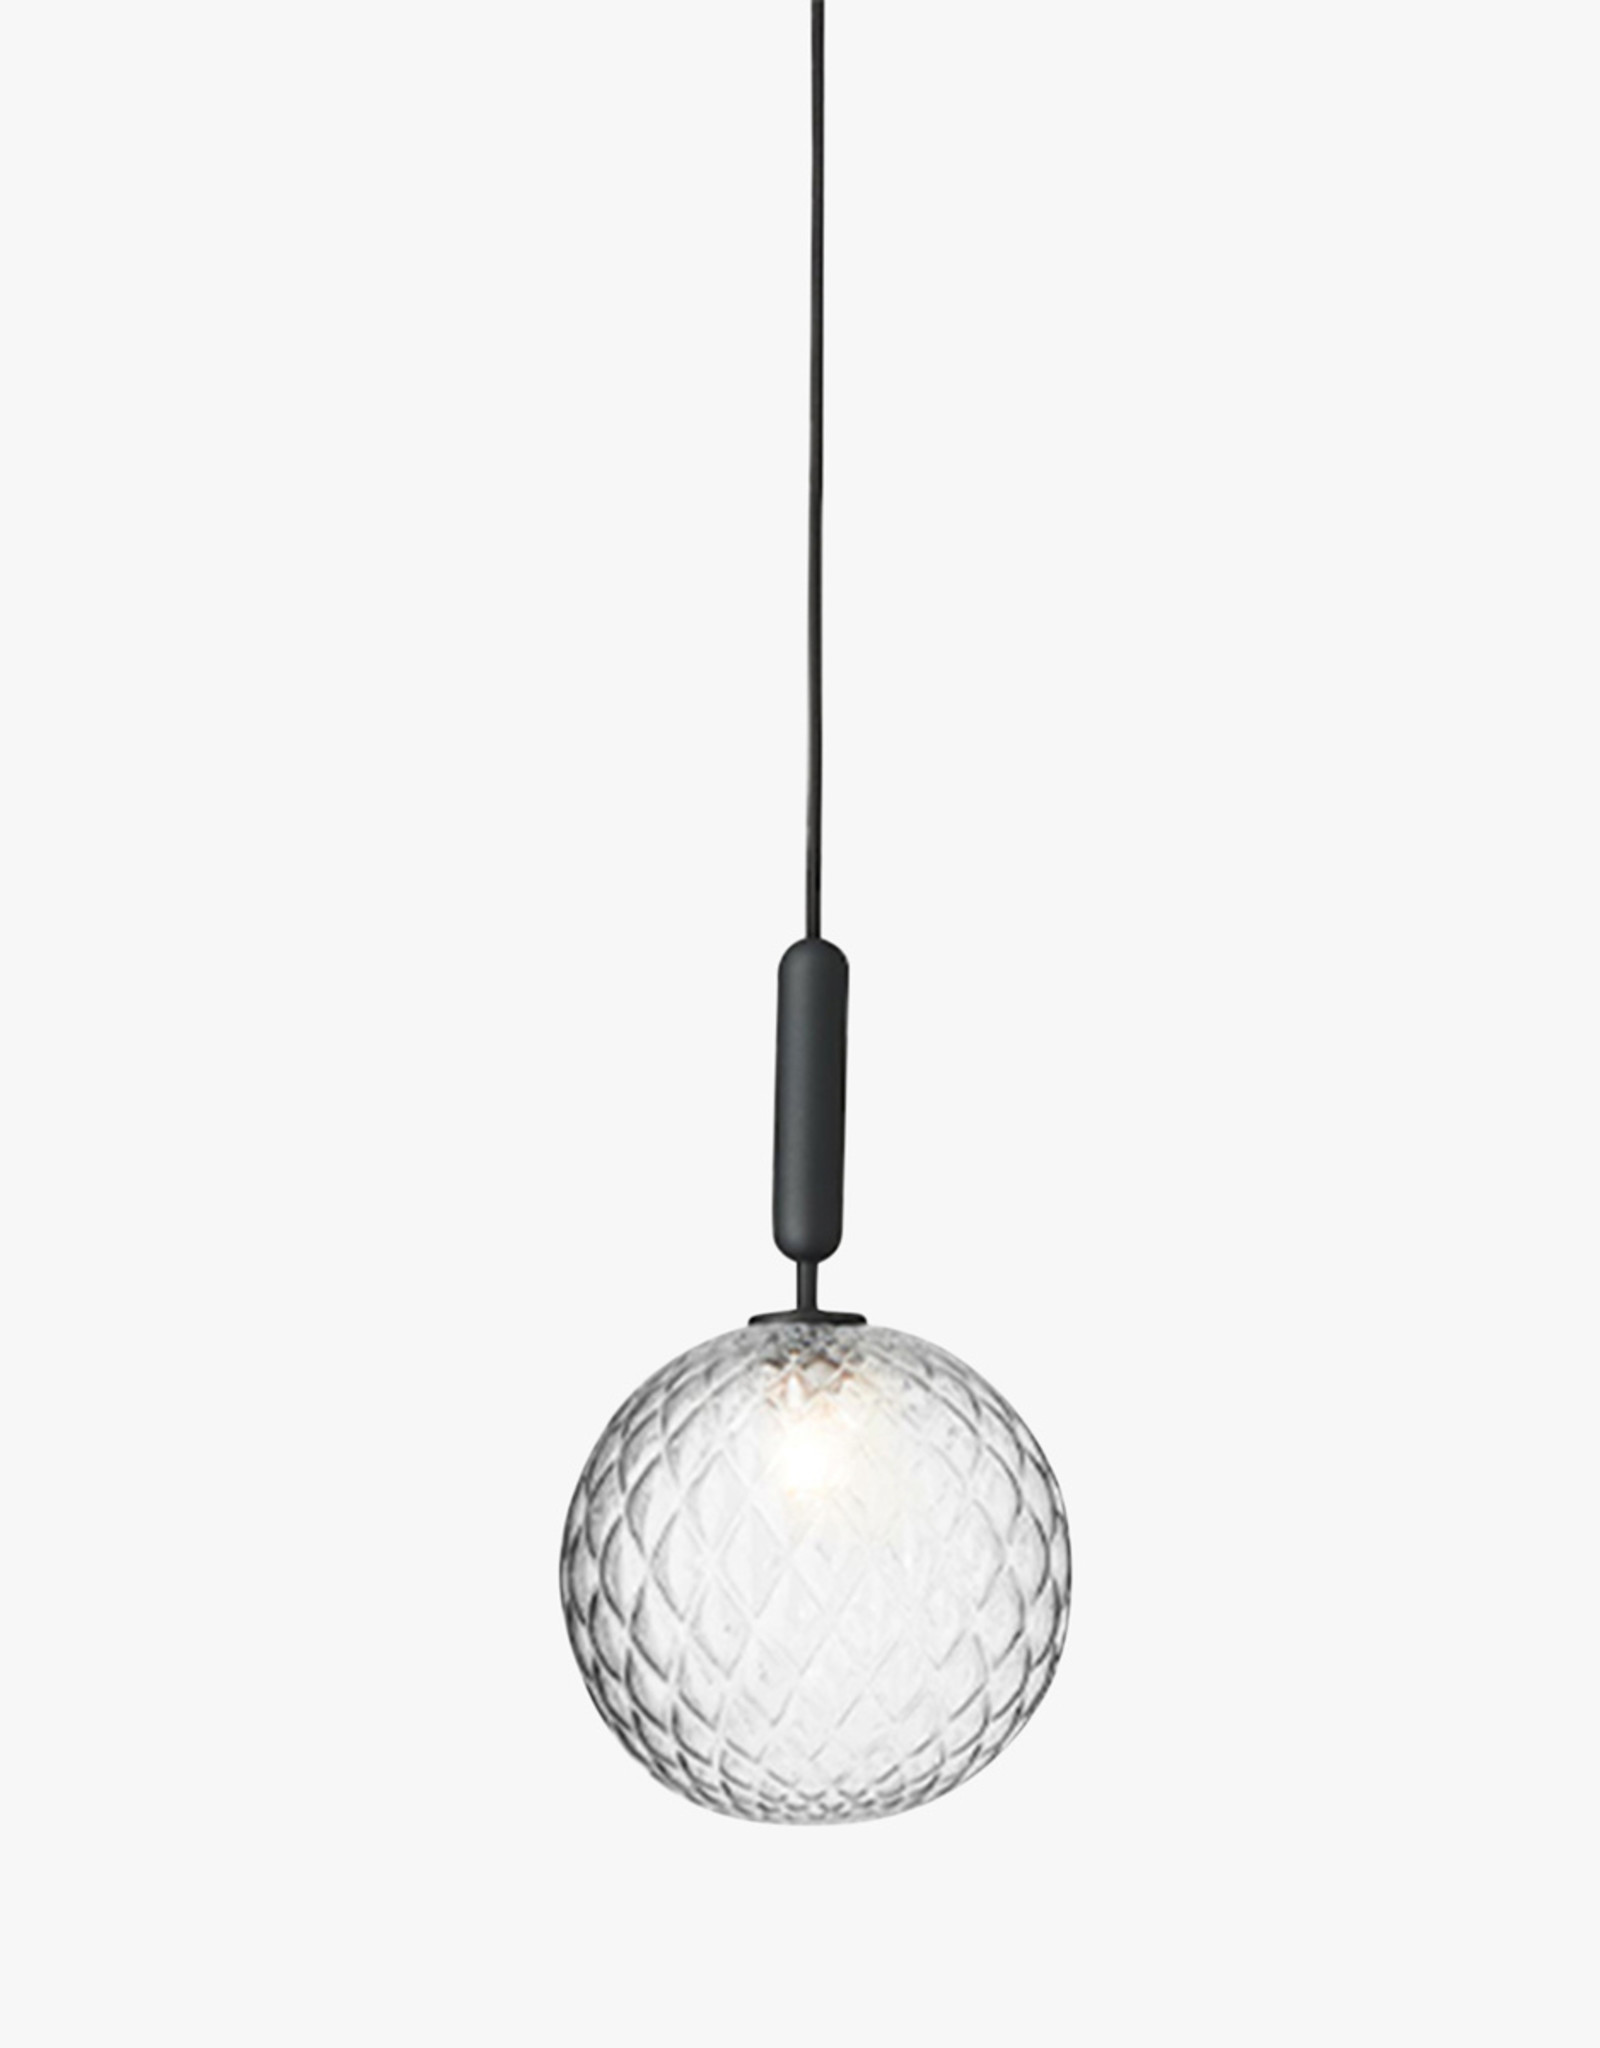 Nuura Miira 1 pendant by Sofie Refer | L | Rock grey/optic clear